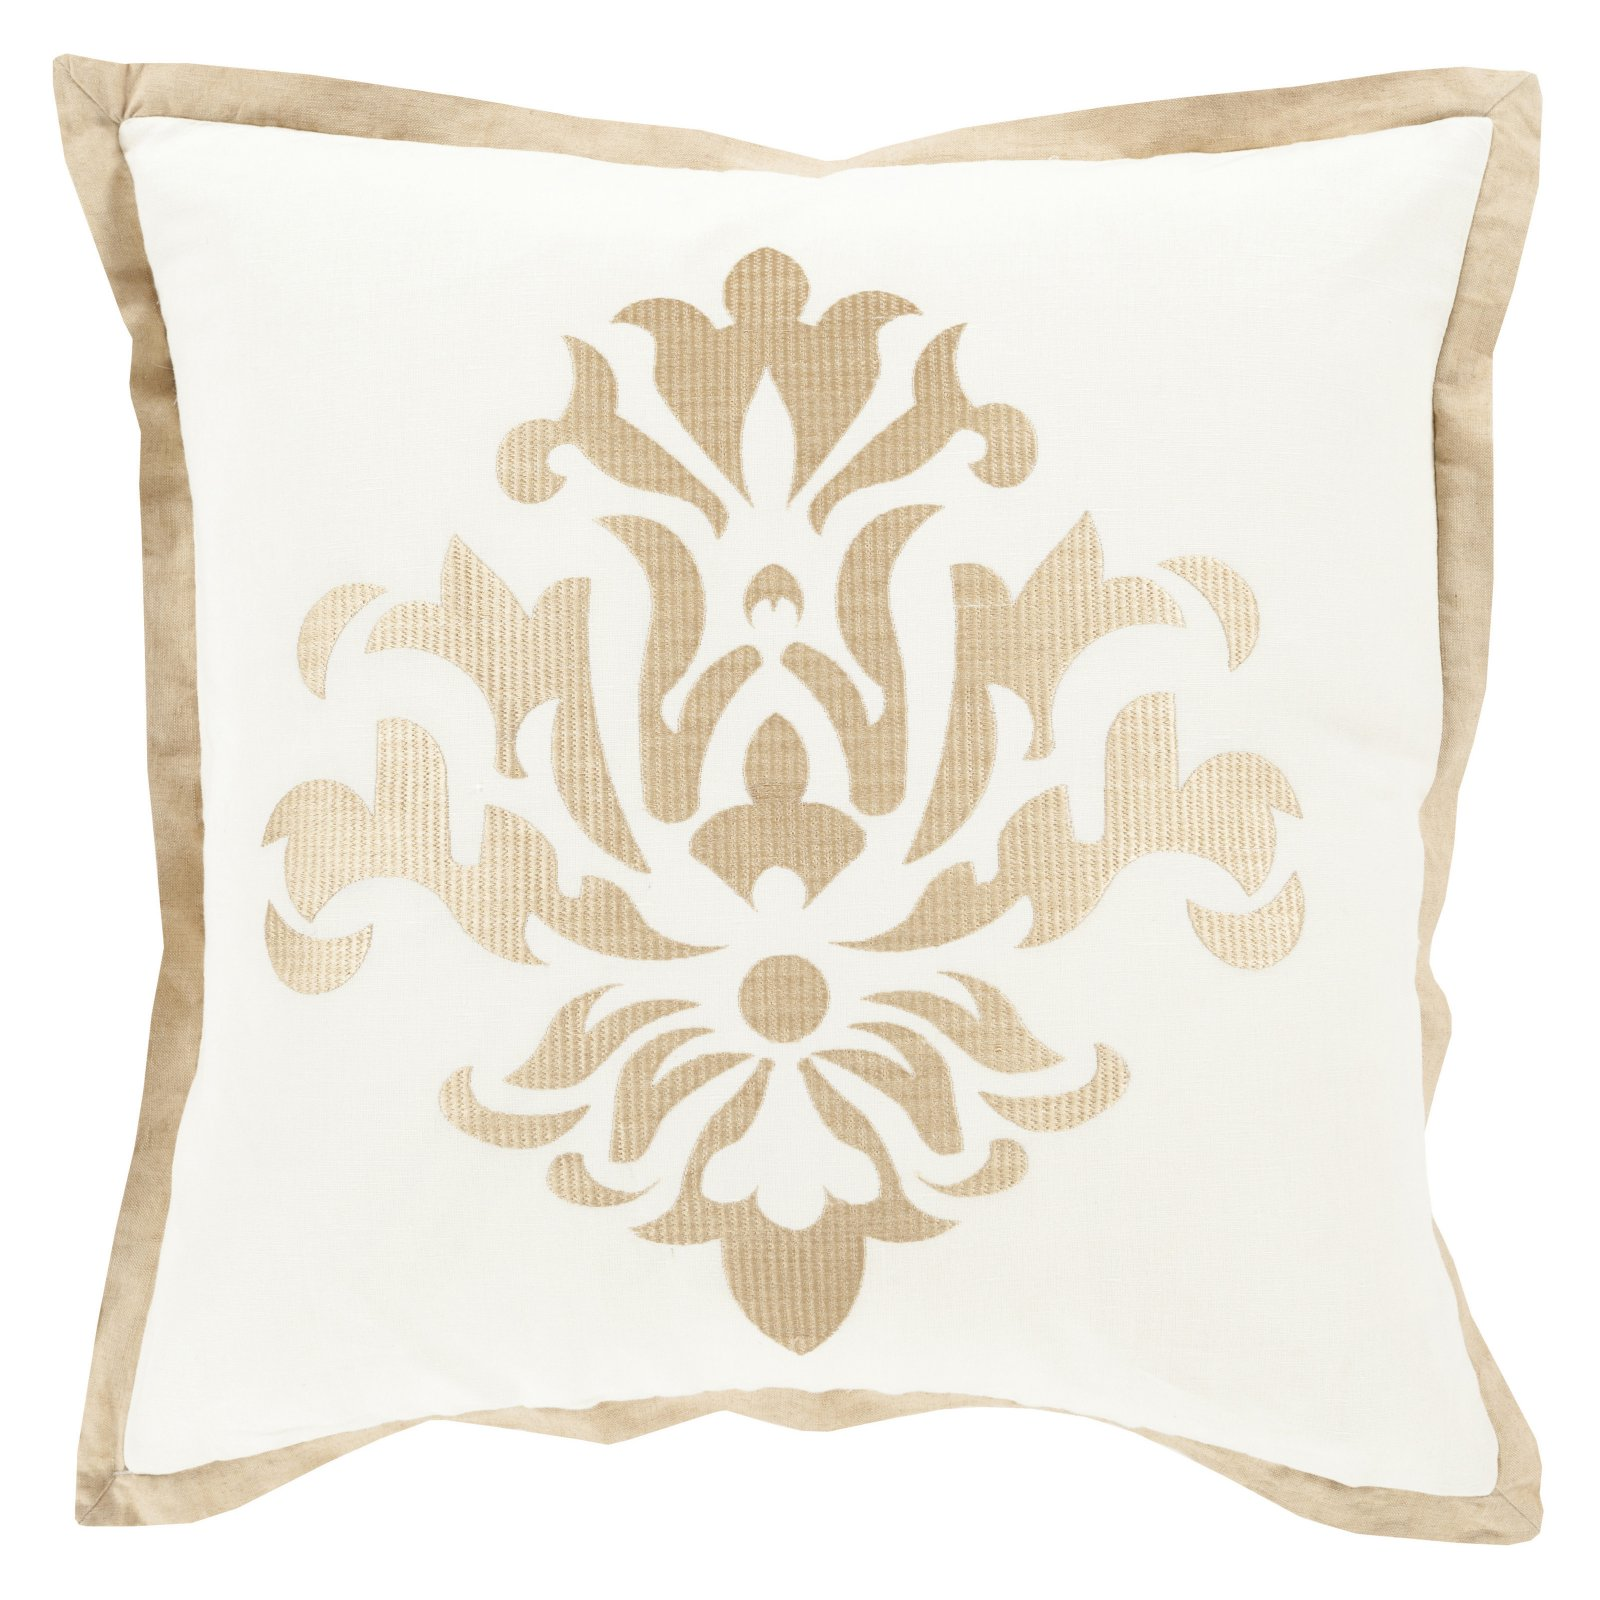 Surya Sparkling Damask Decorative Throw Pillow